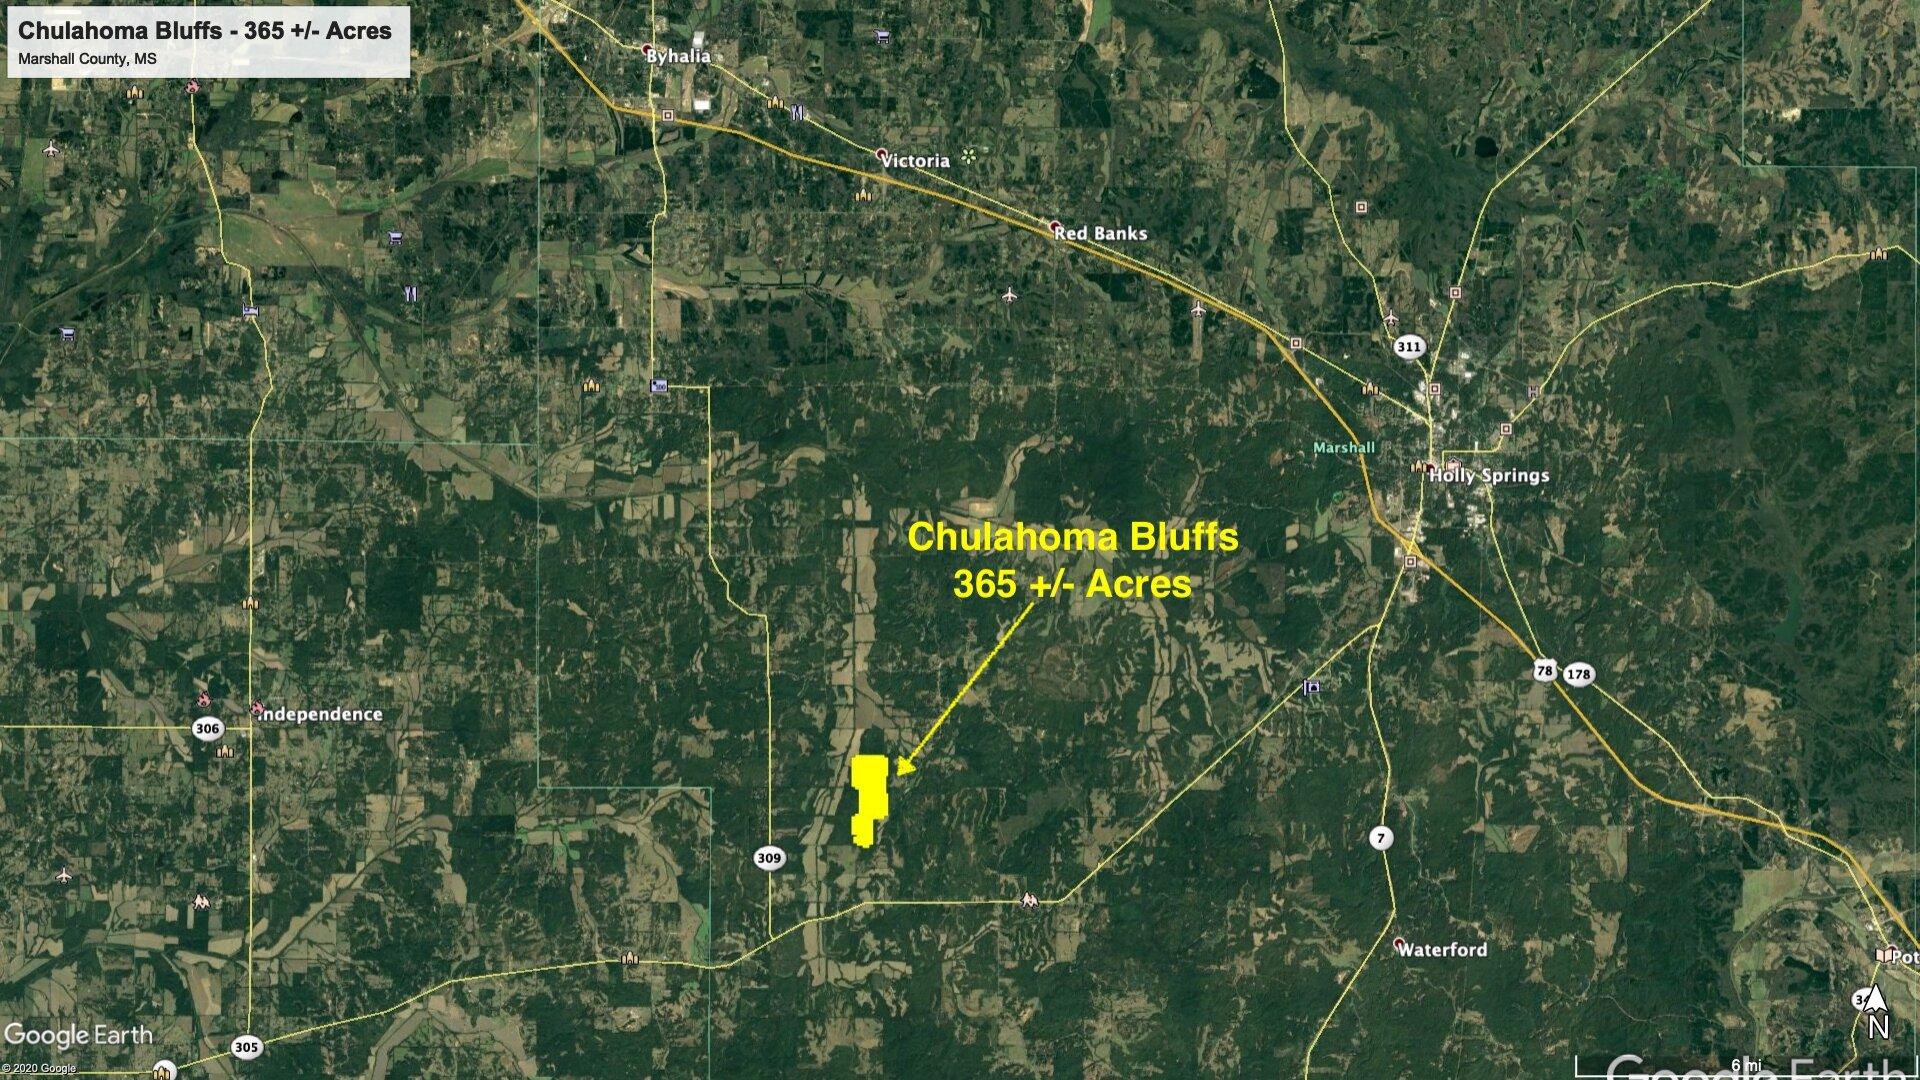 Chulahoma Bluffs- Wide.jpg